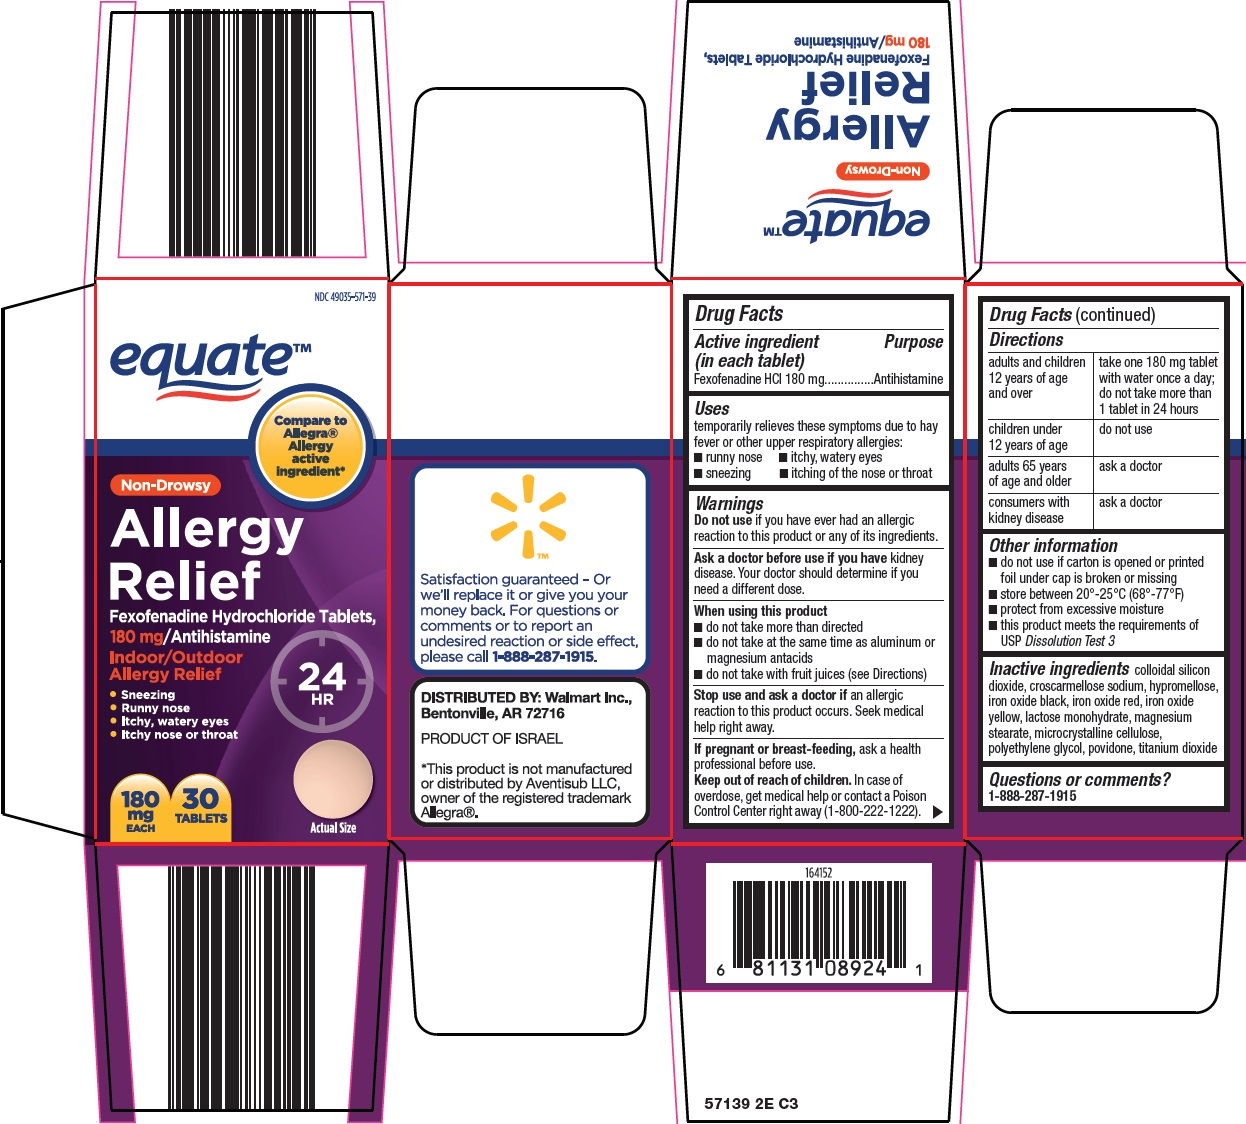 571-2e-allergy-relief.jpg